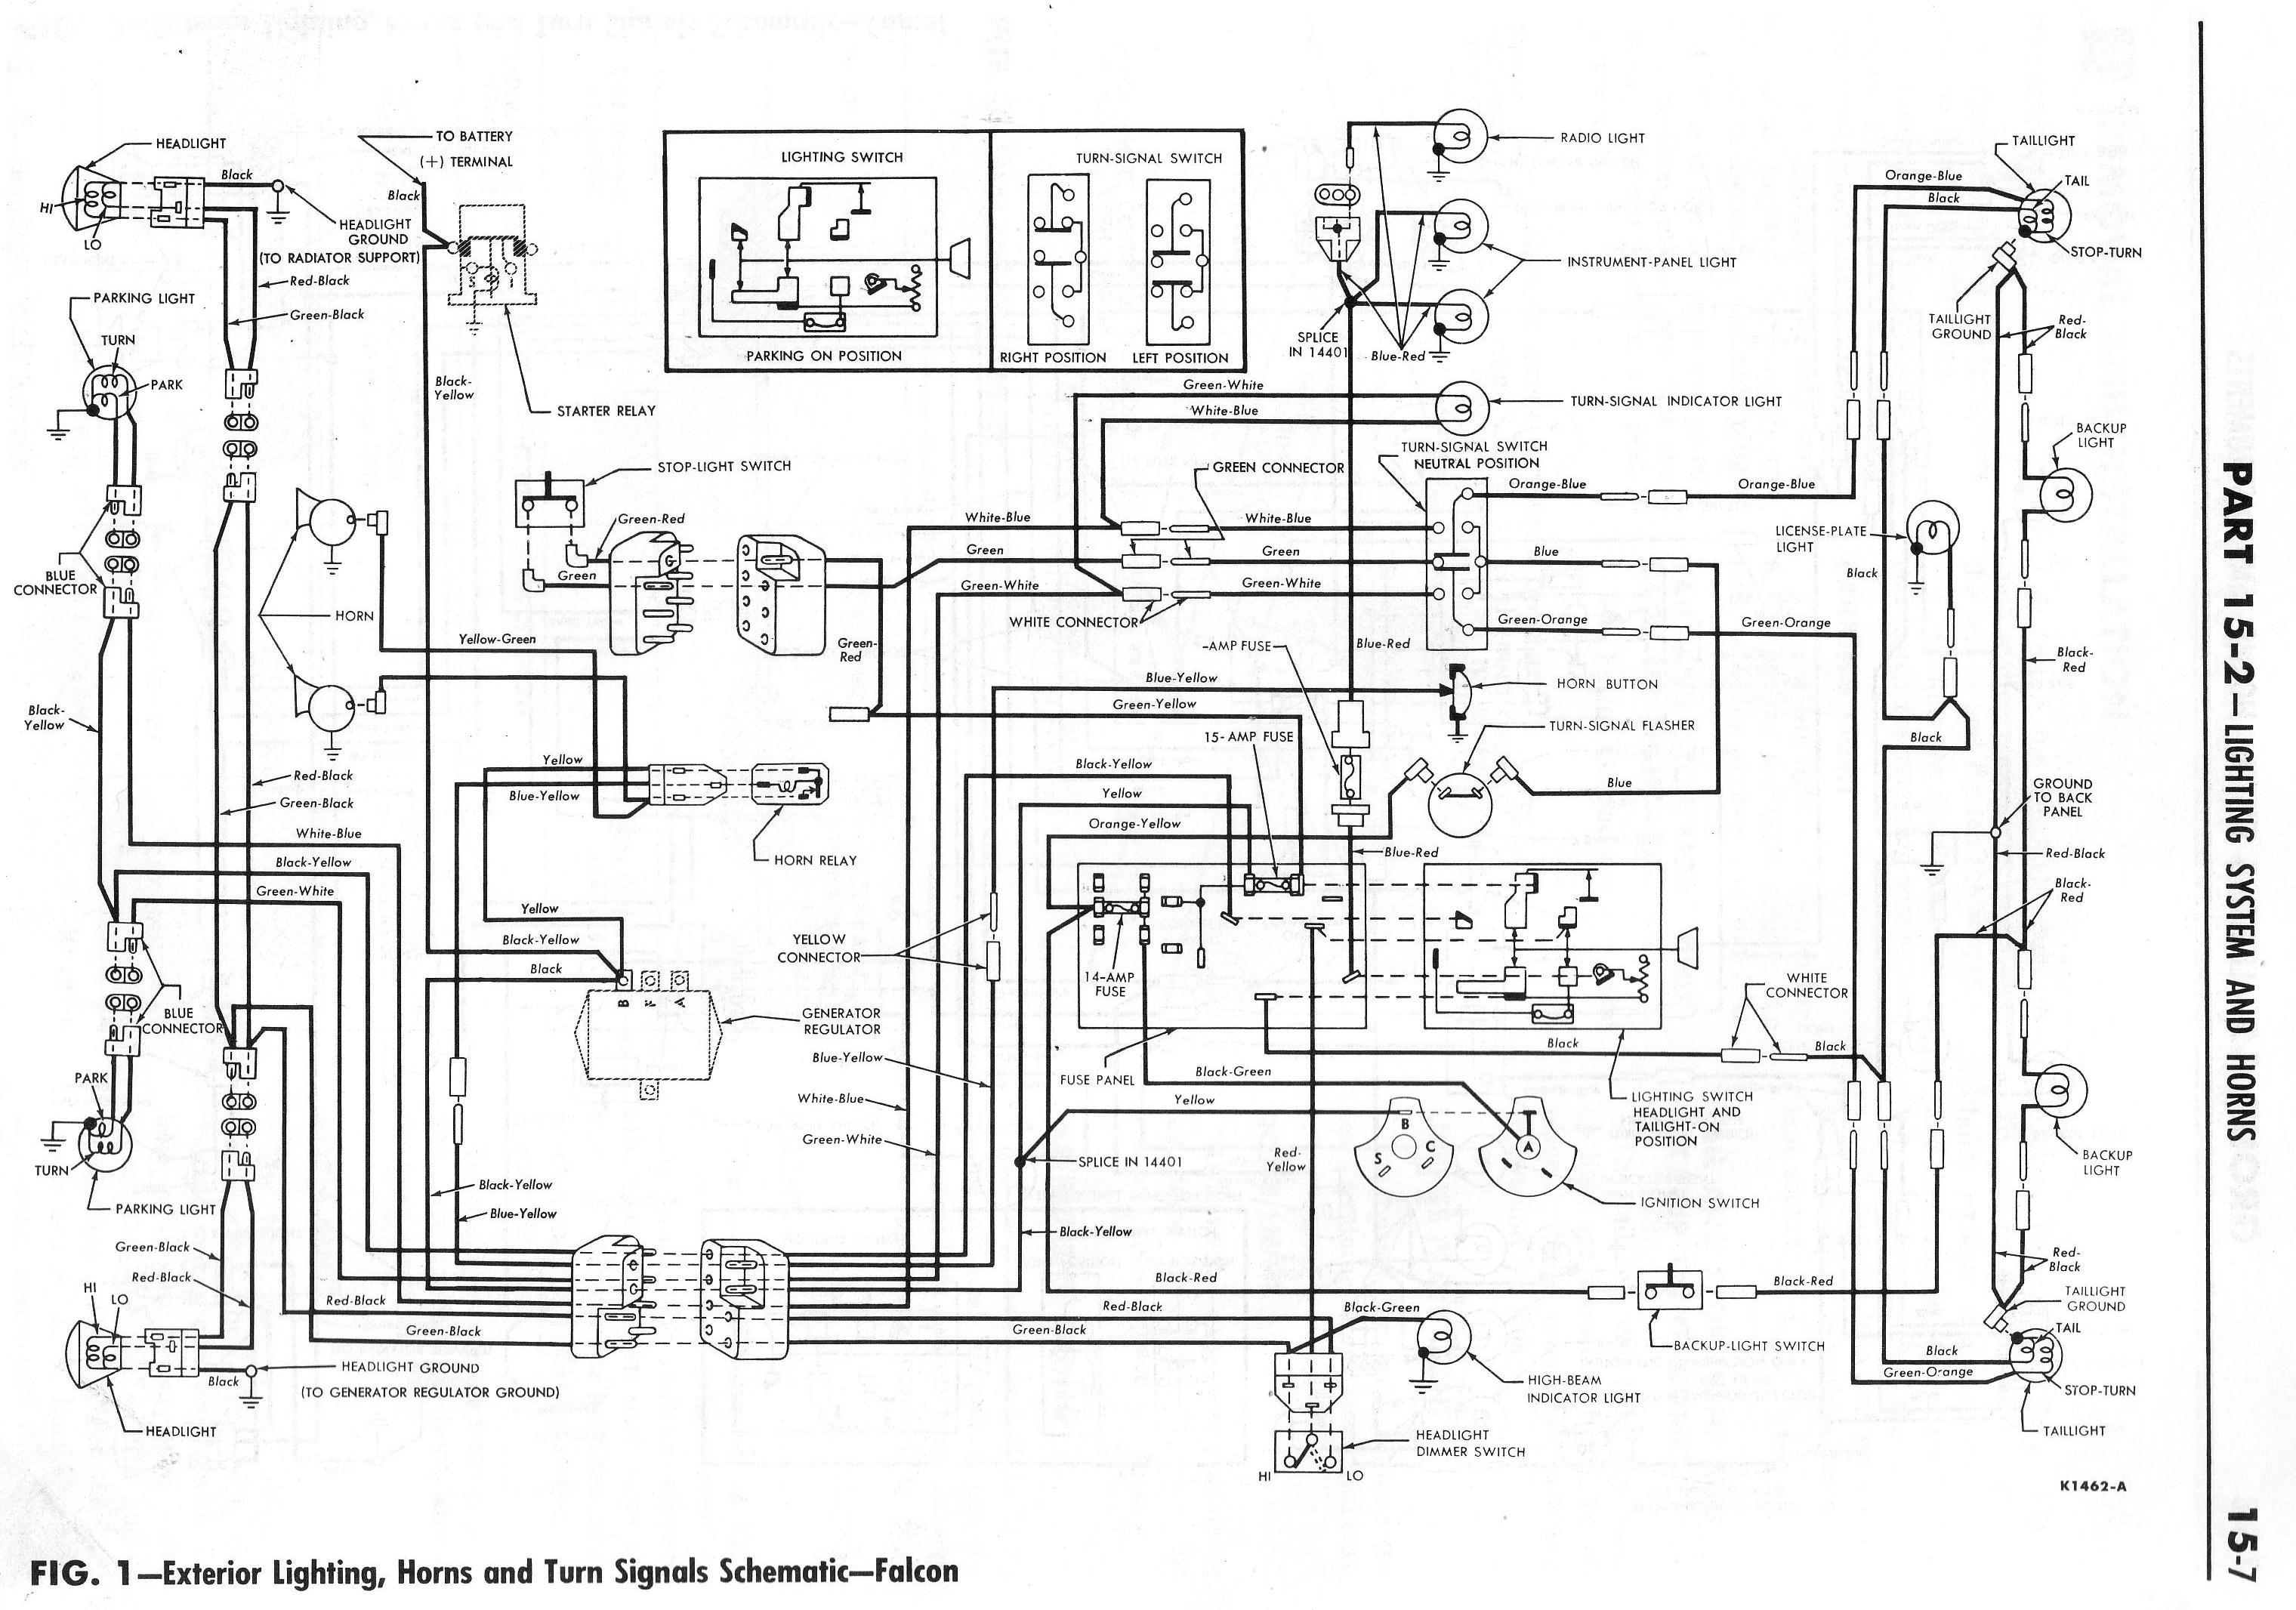 1964 Ranchero Wiring Diagrams - Model A Ford Wiring Diagram